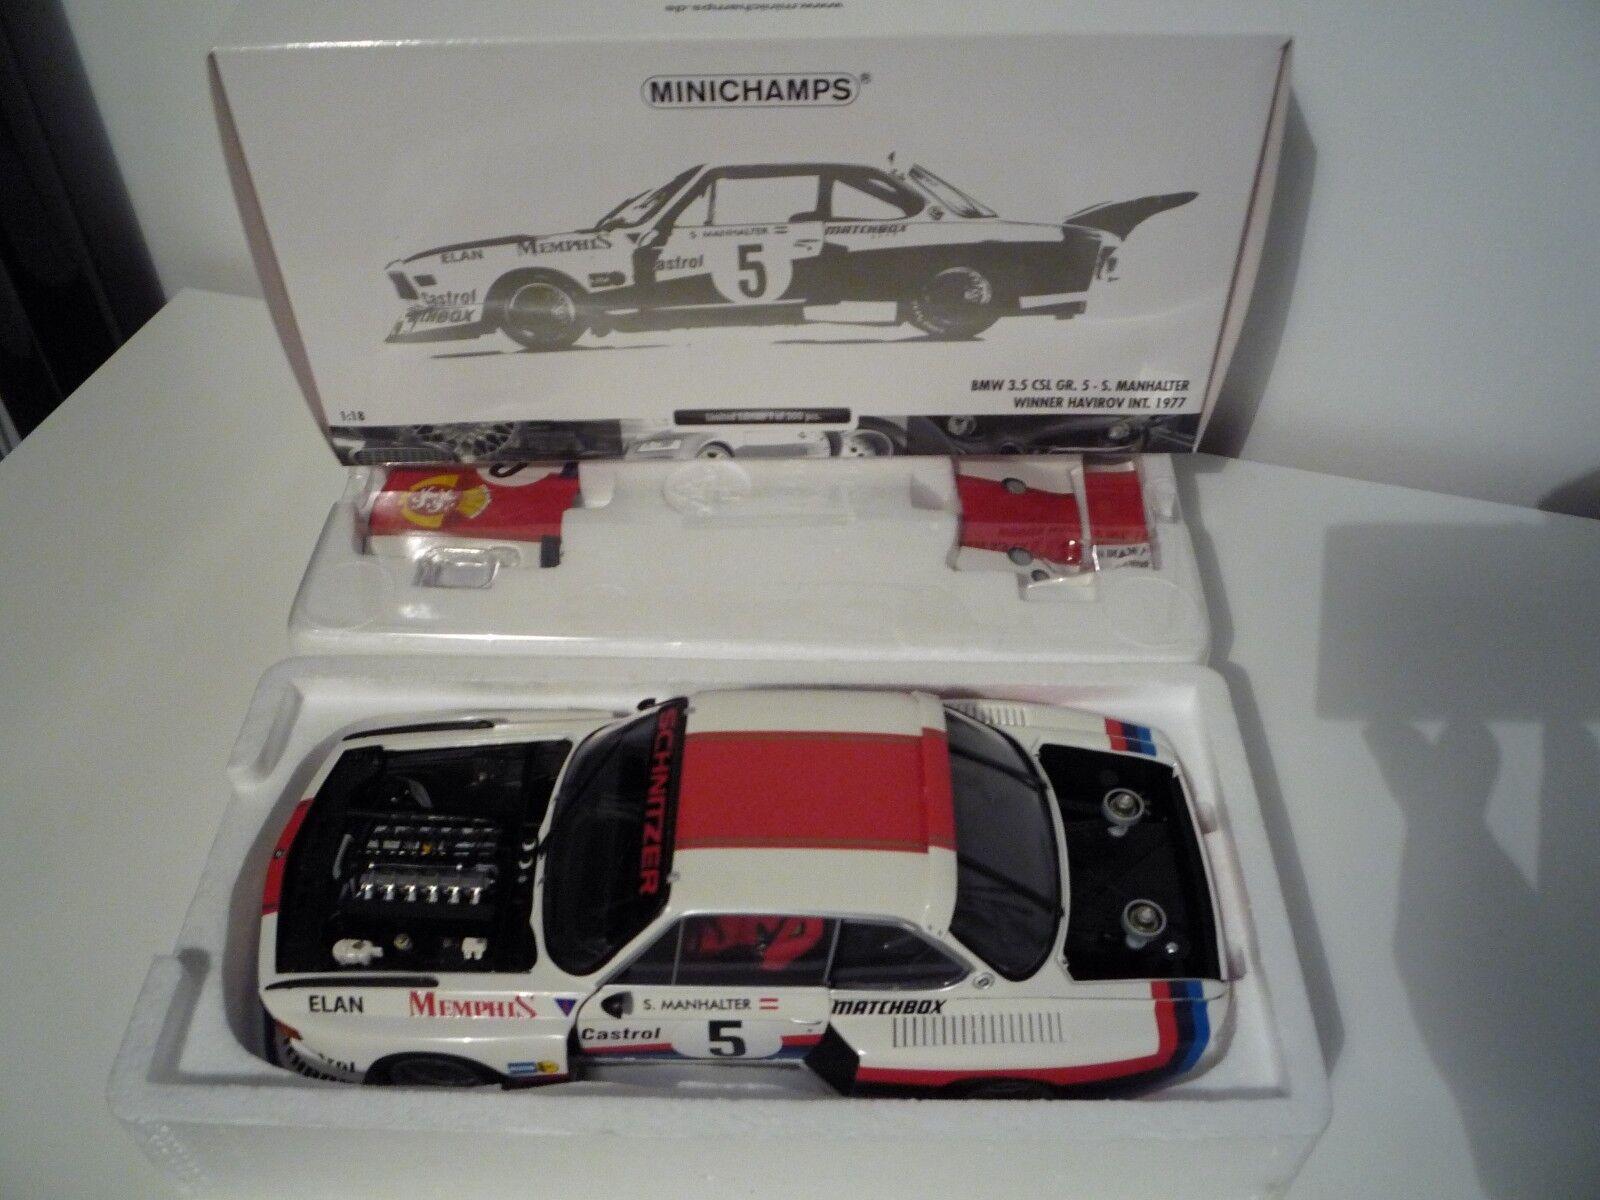 Minichamps BMW 3.5 CSL Havirov inter 1977 1:18 180772005